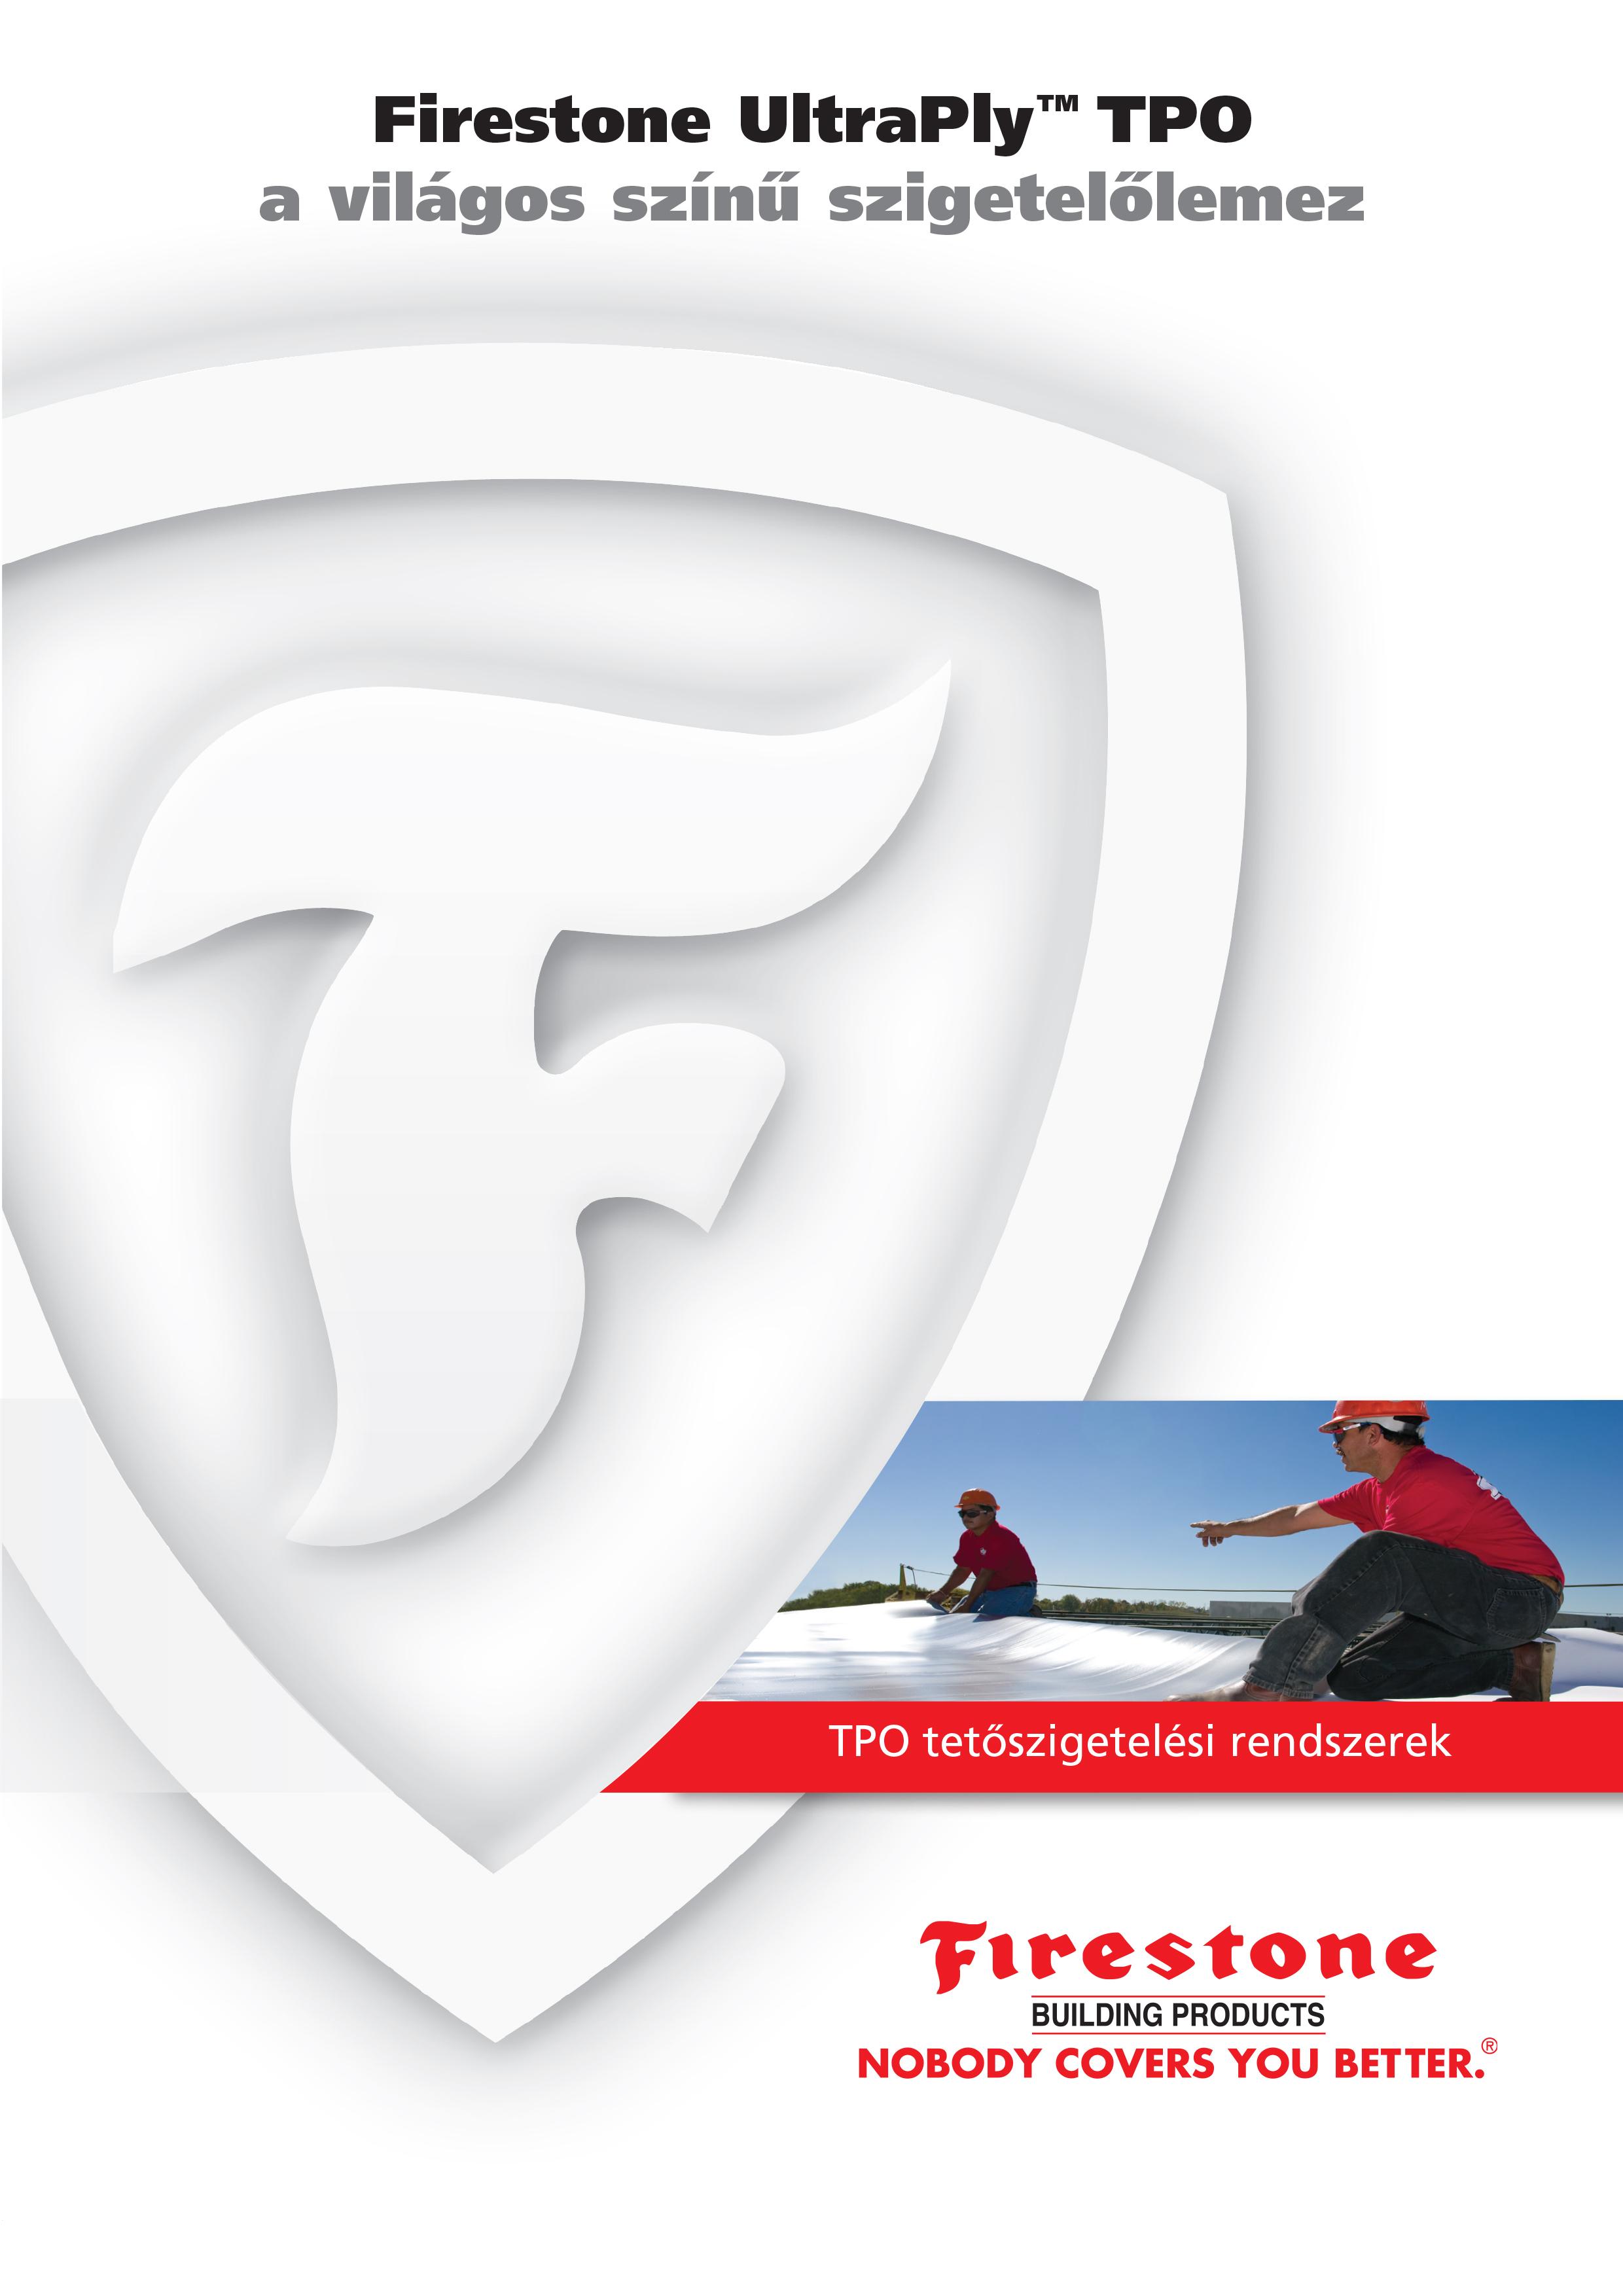 Laposteto szigeteles Firestone UltraPly TPO/FPO brossúra